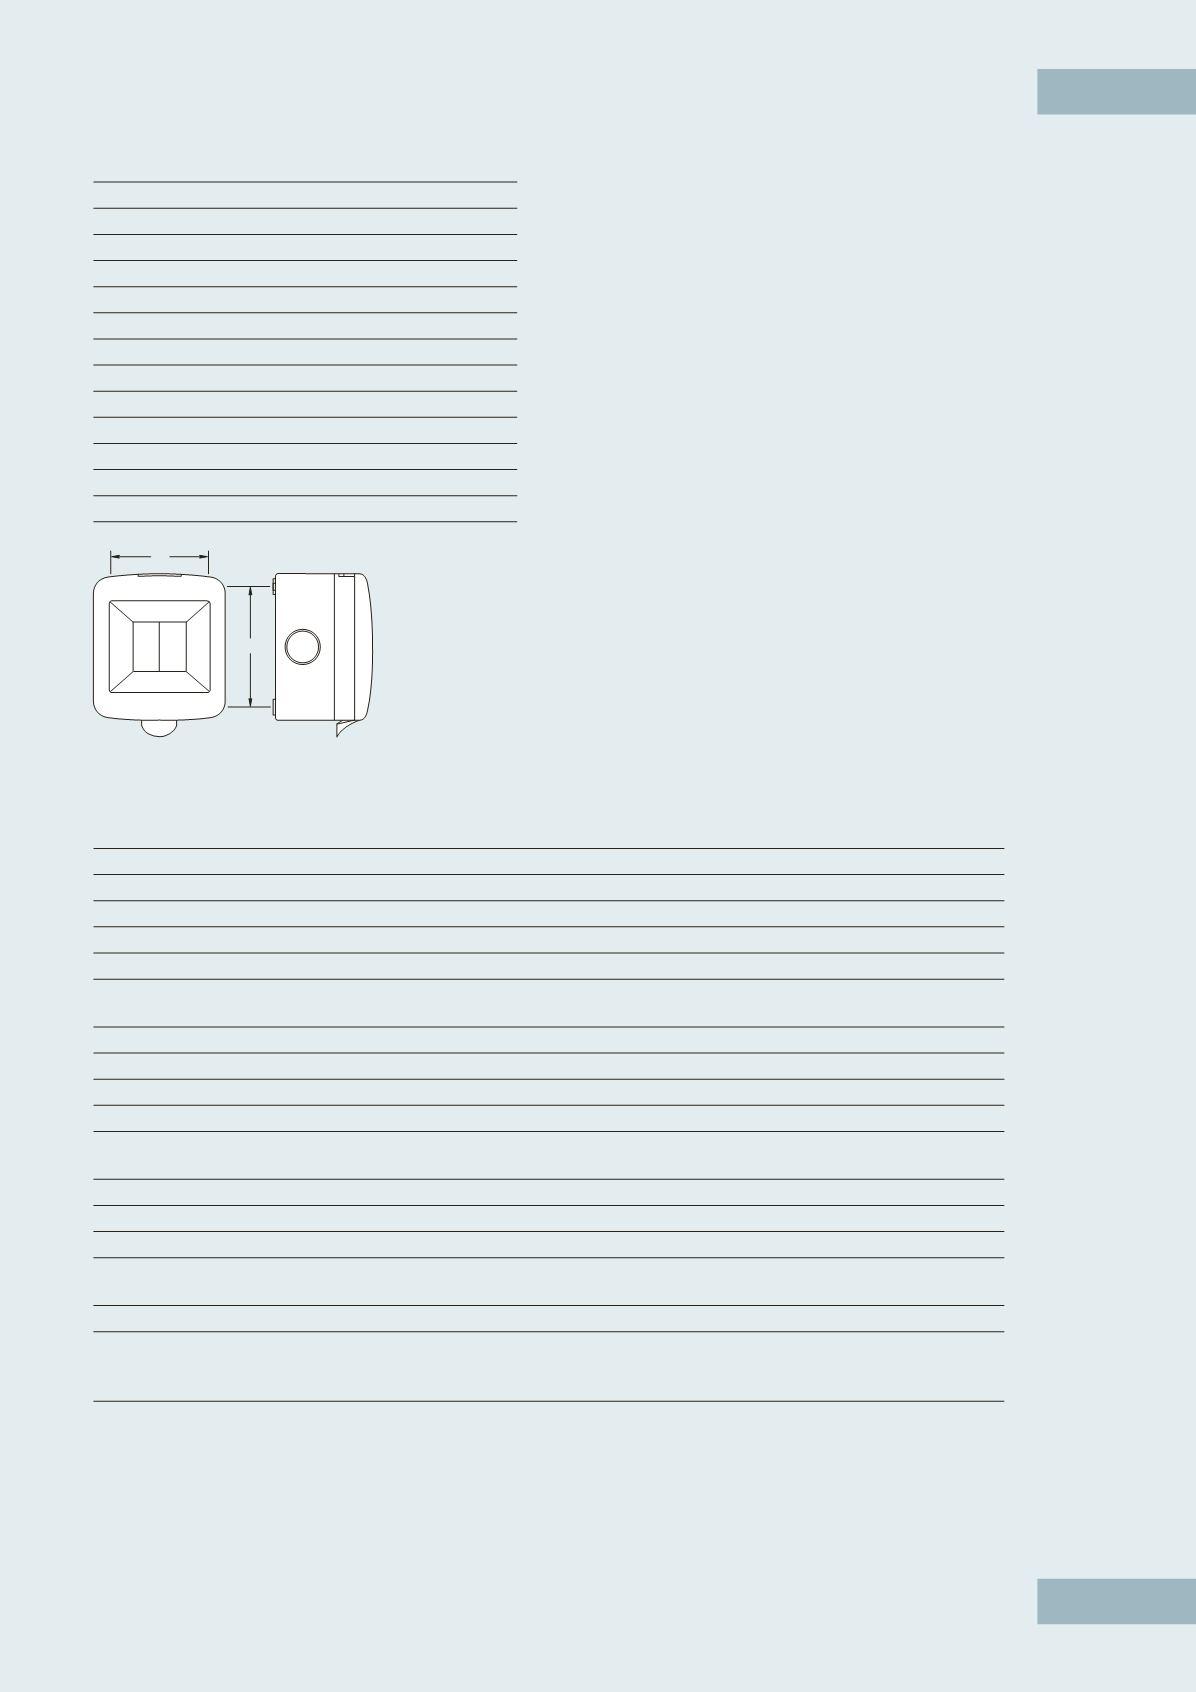 2 gang cooker switch wiring diagram upright scissor lift volex library